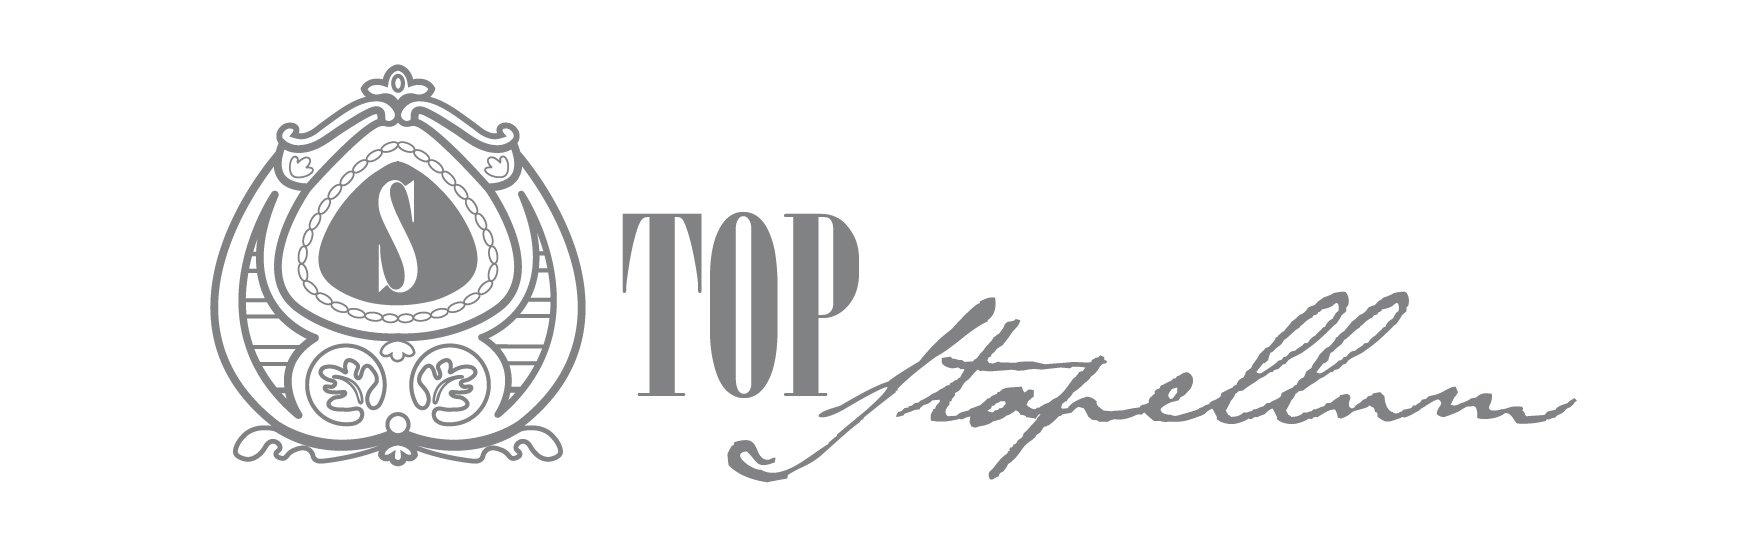 logo e scritta top itapellum